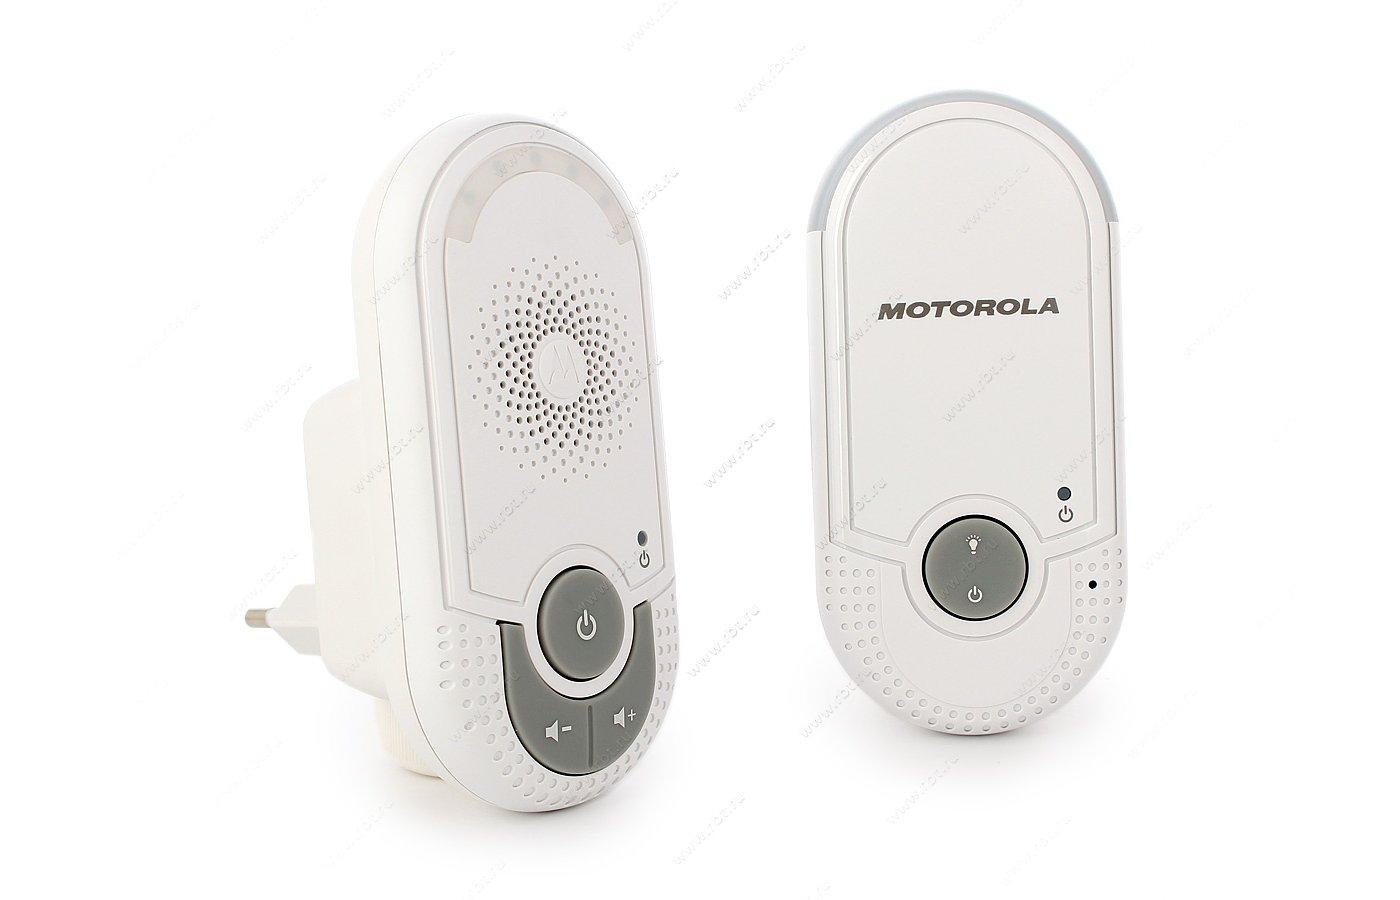 Motorola MBP 8 радионяня